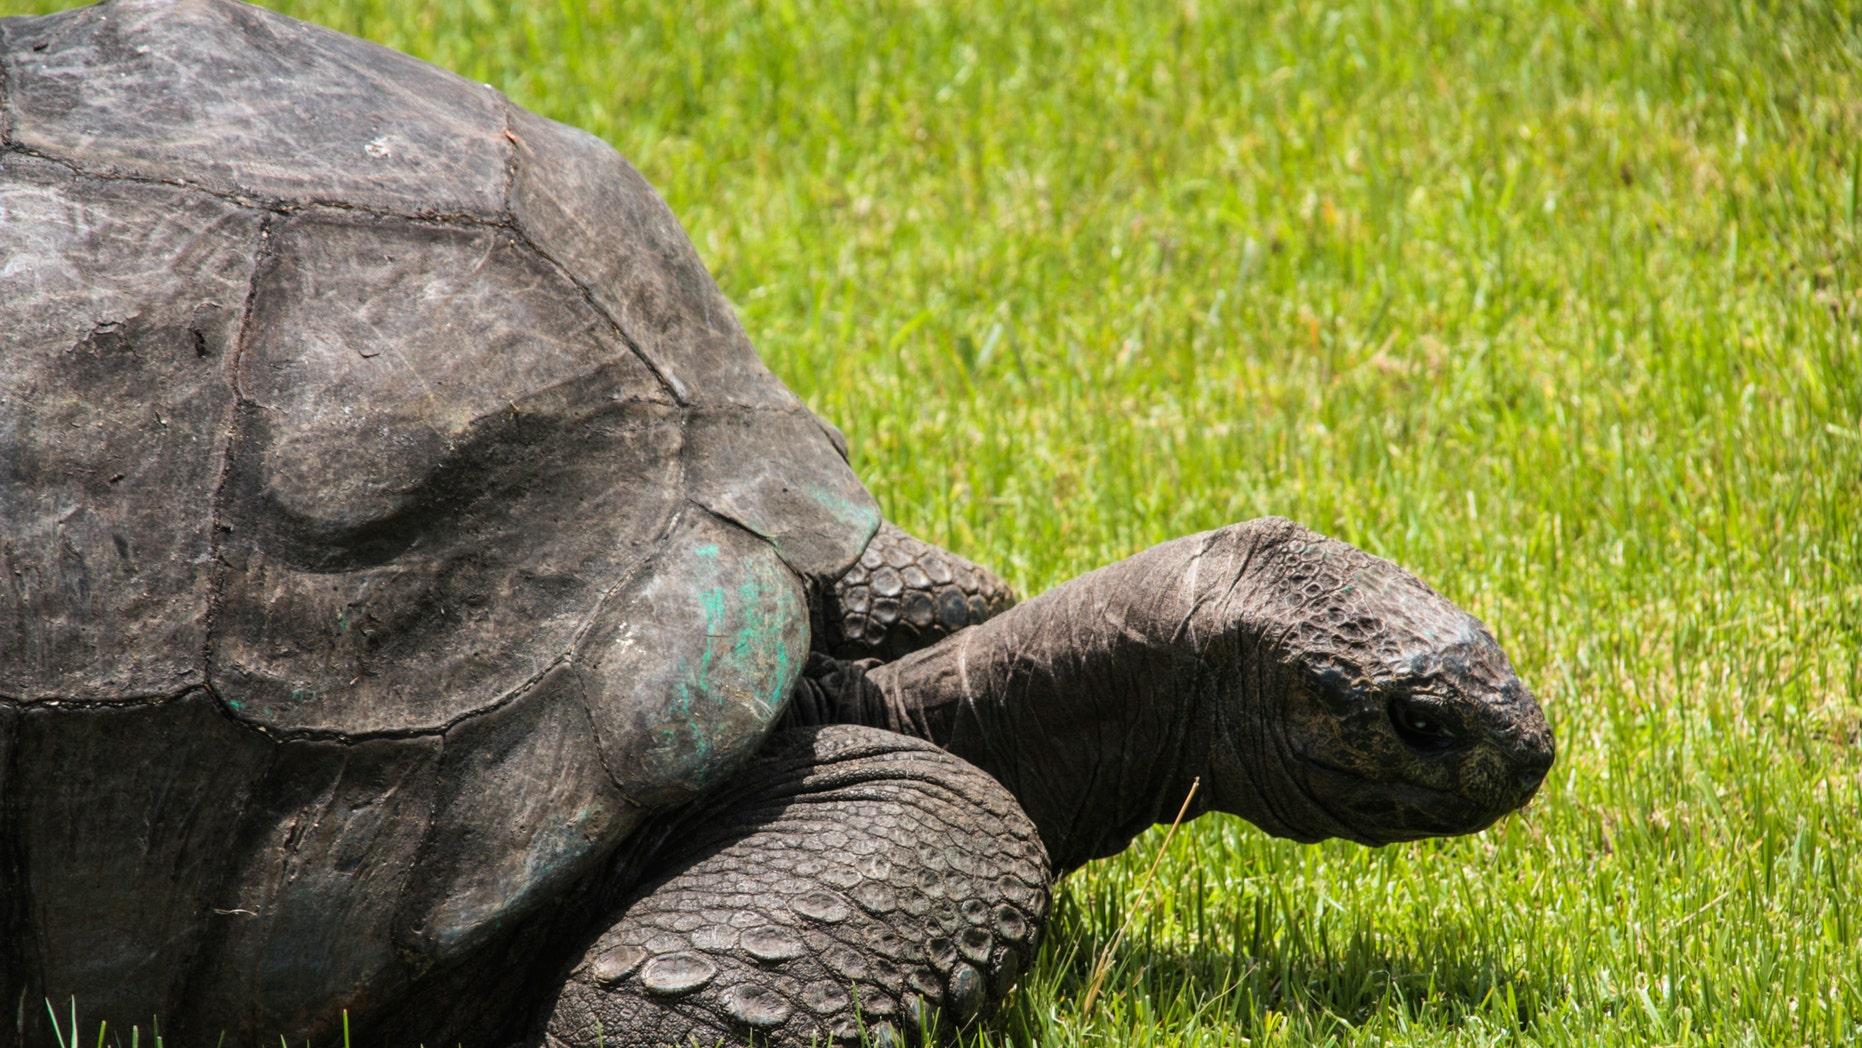 File photo of Jonathan the tortoise (Steven Humphreys/iStock).